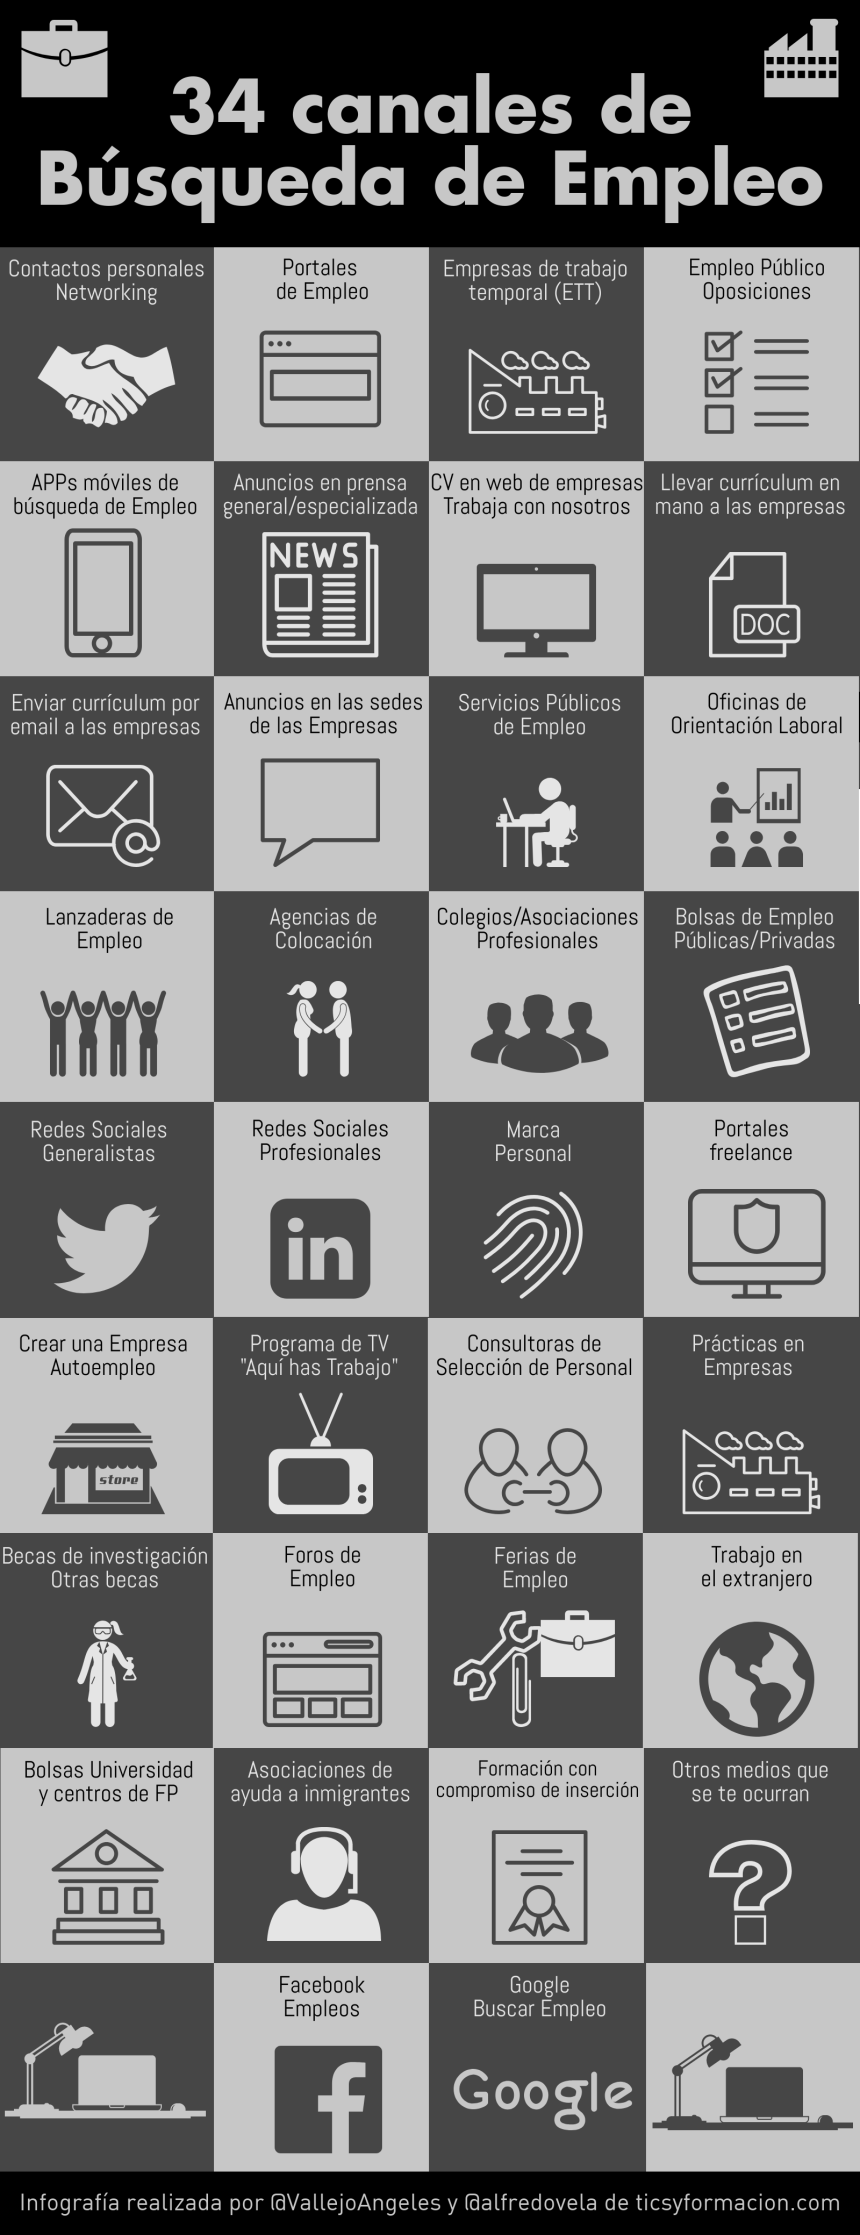 34 canales de Búsqueda de Empleo #infografia #infographic #Empleo